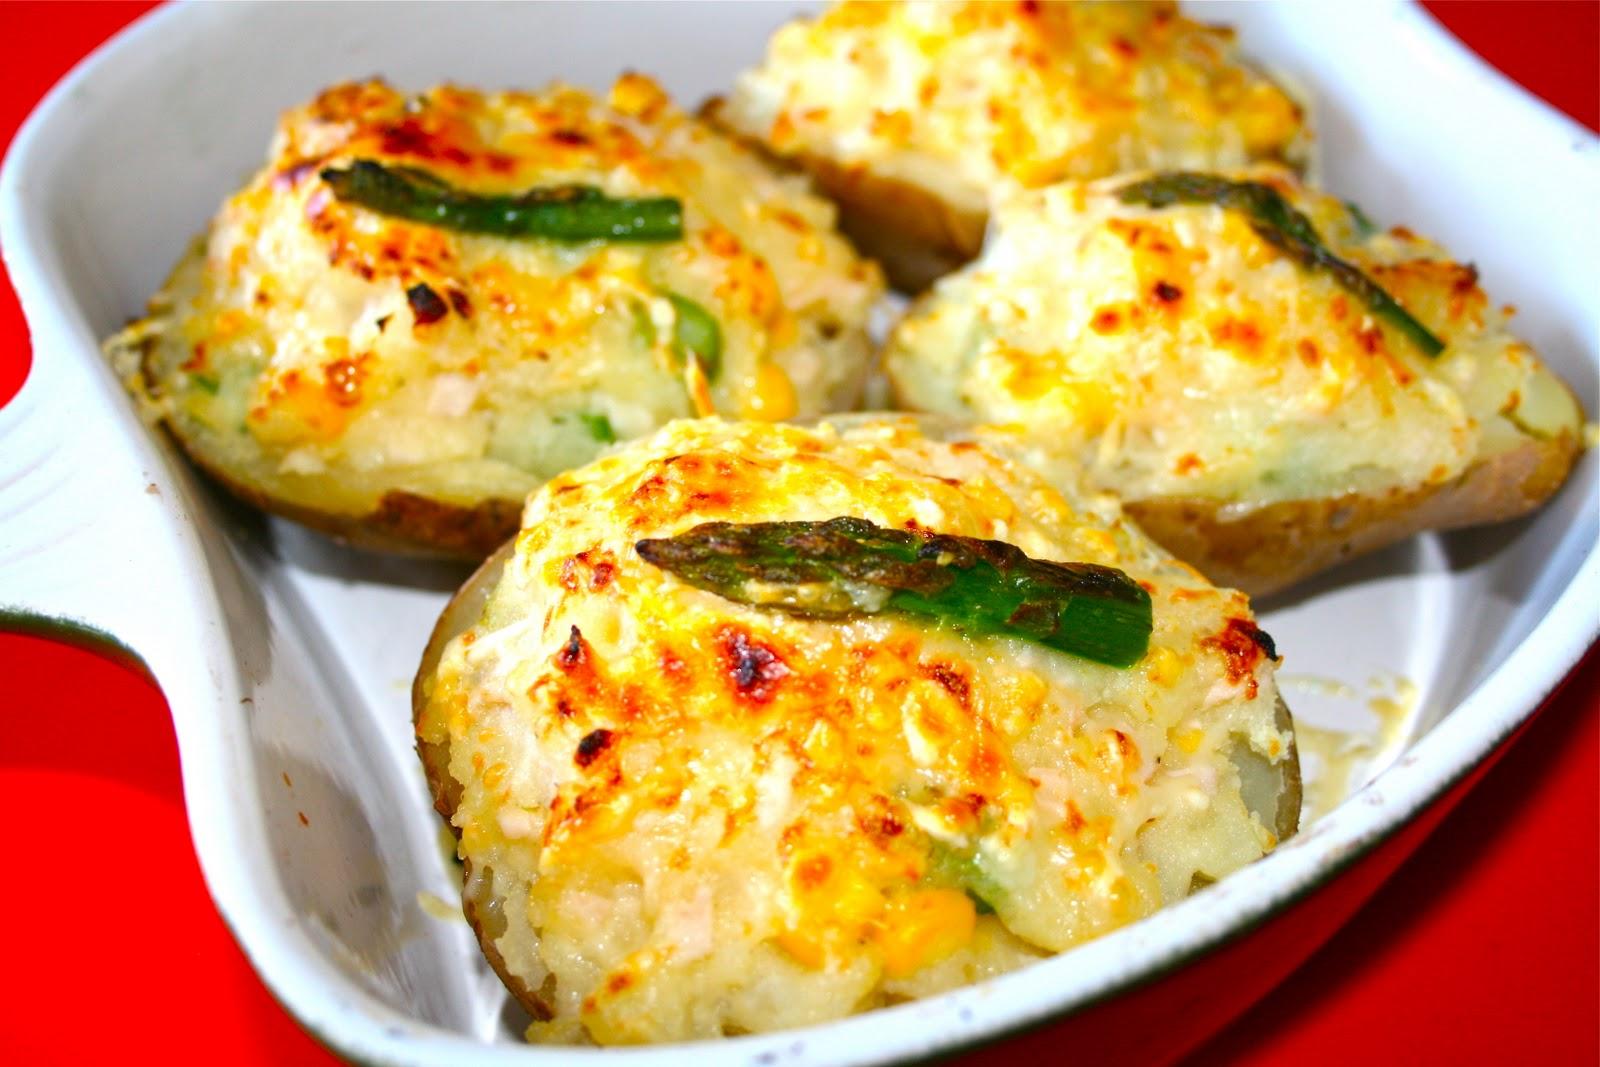 Vericook patatas rellenas al horno - Verduras rellenas al horno ...